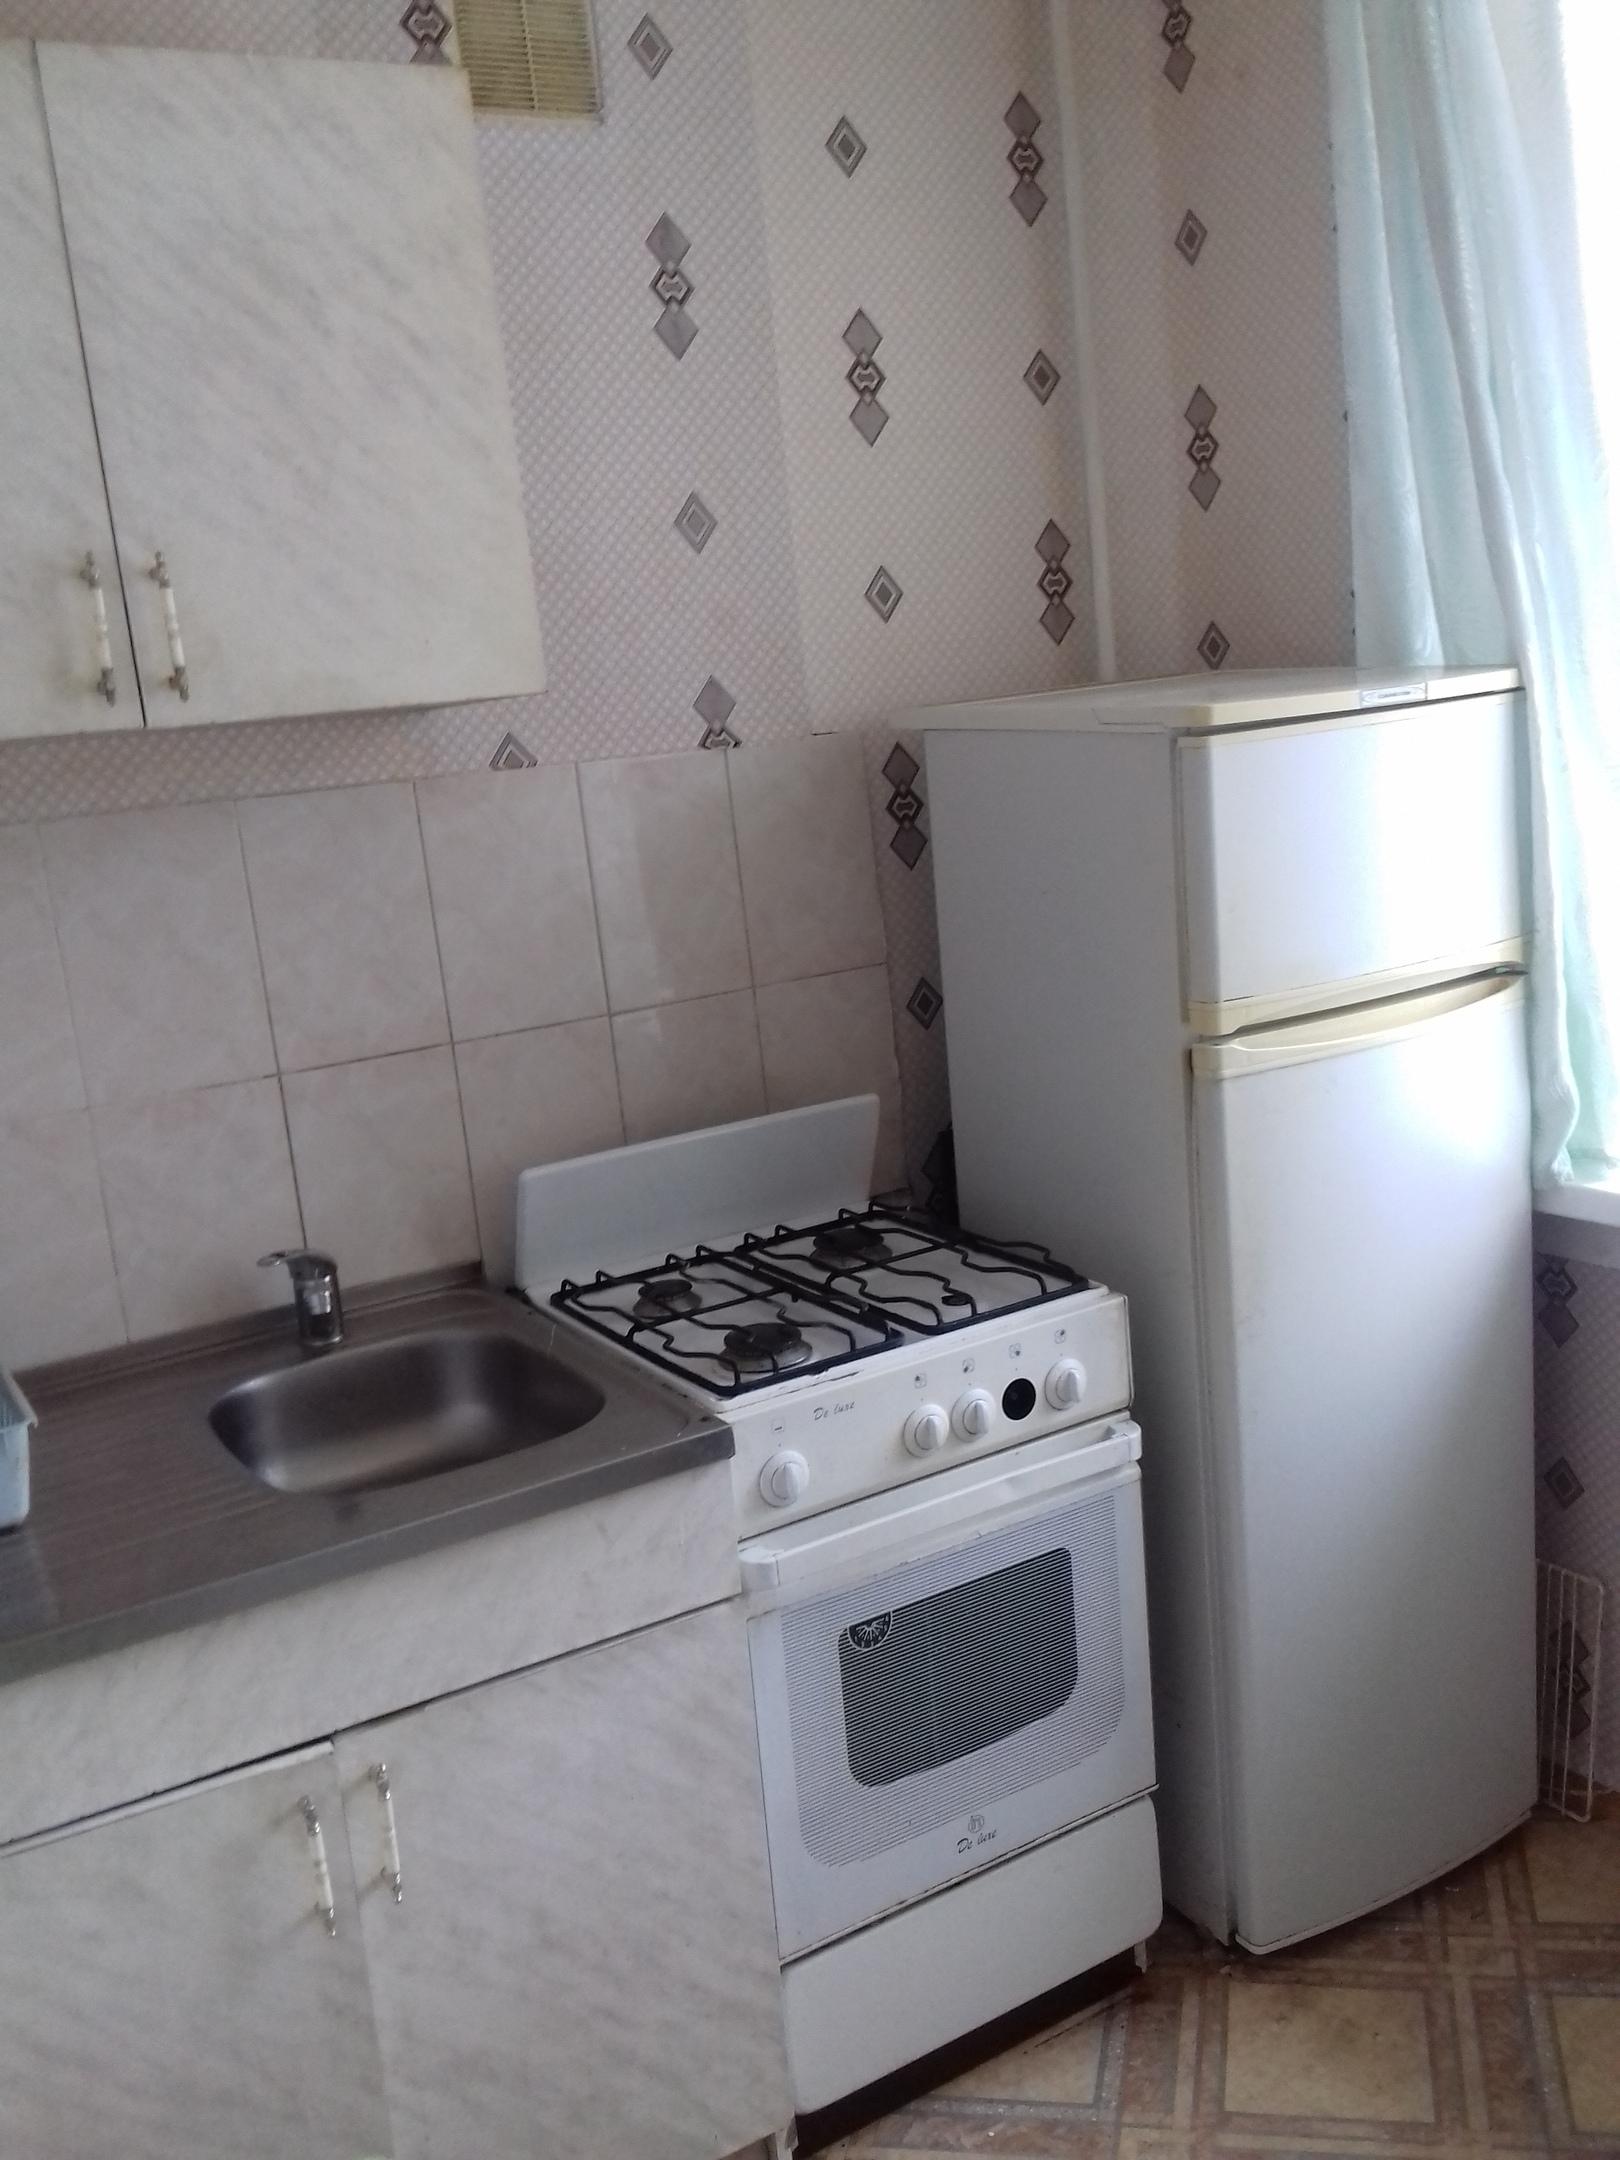 Сдам 2 комнатную квартиру в районе 240 | Объявления Орска и Новотроицка №3623